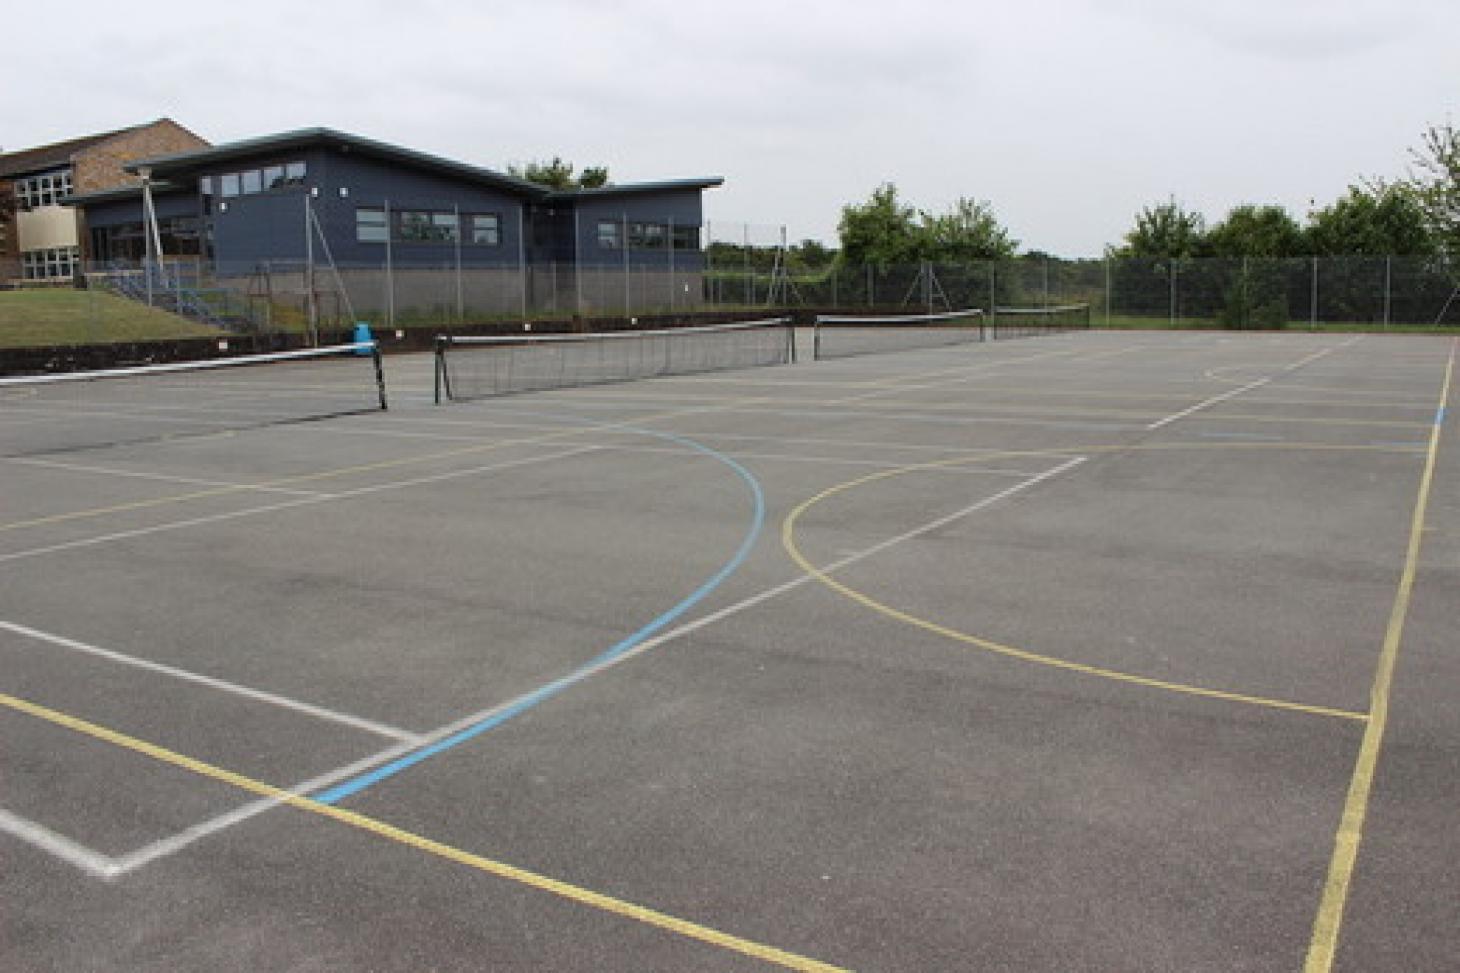 Amersham School Outdoor | Hard (macadam) tennis court